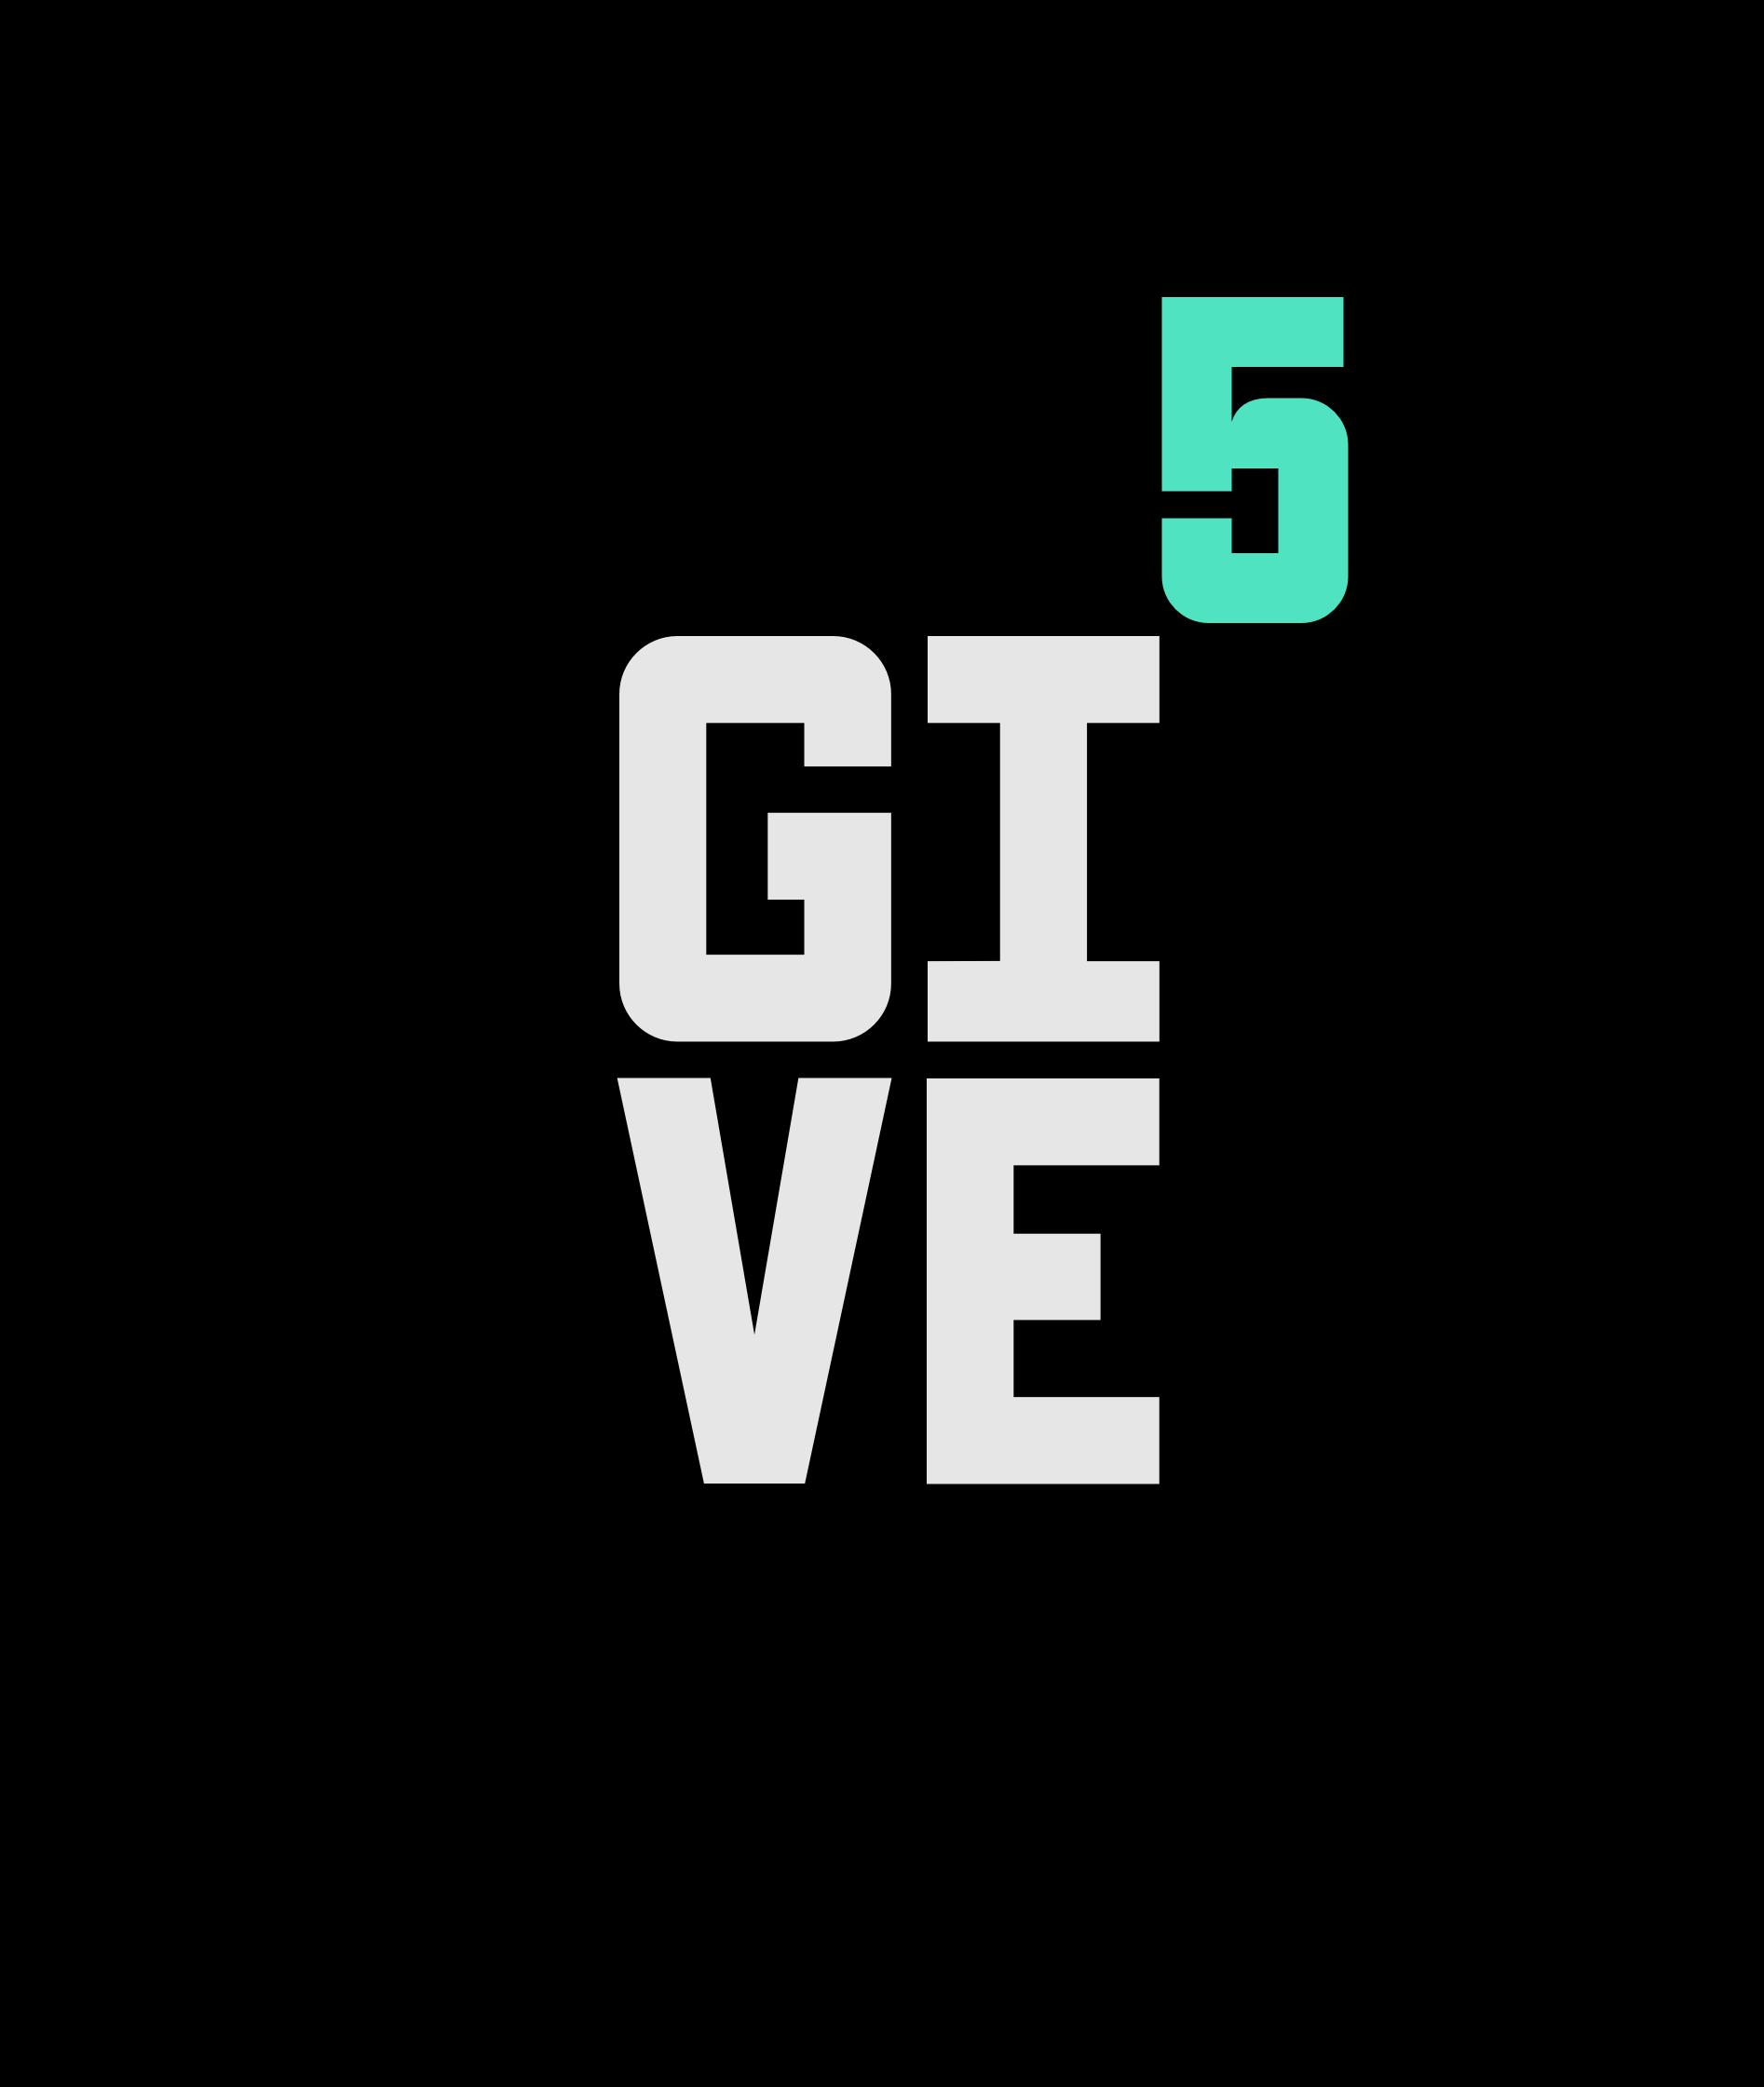 GIve5_2015LUAshirt.png